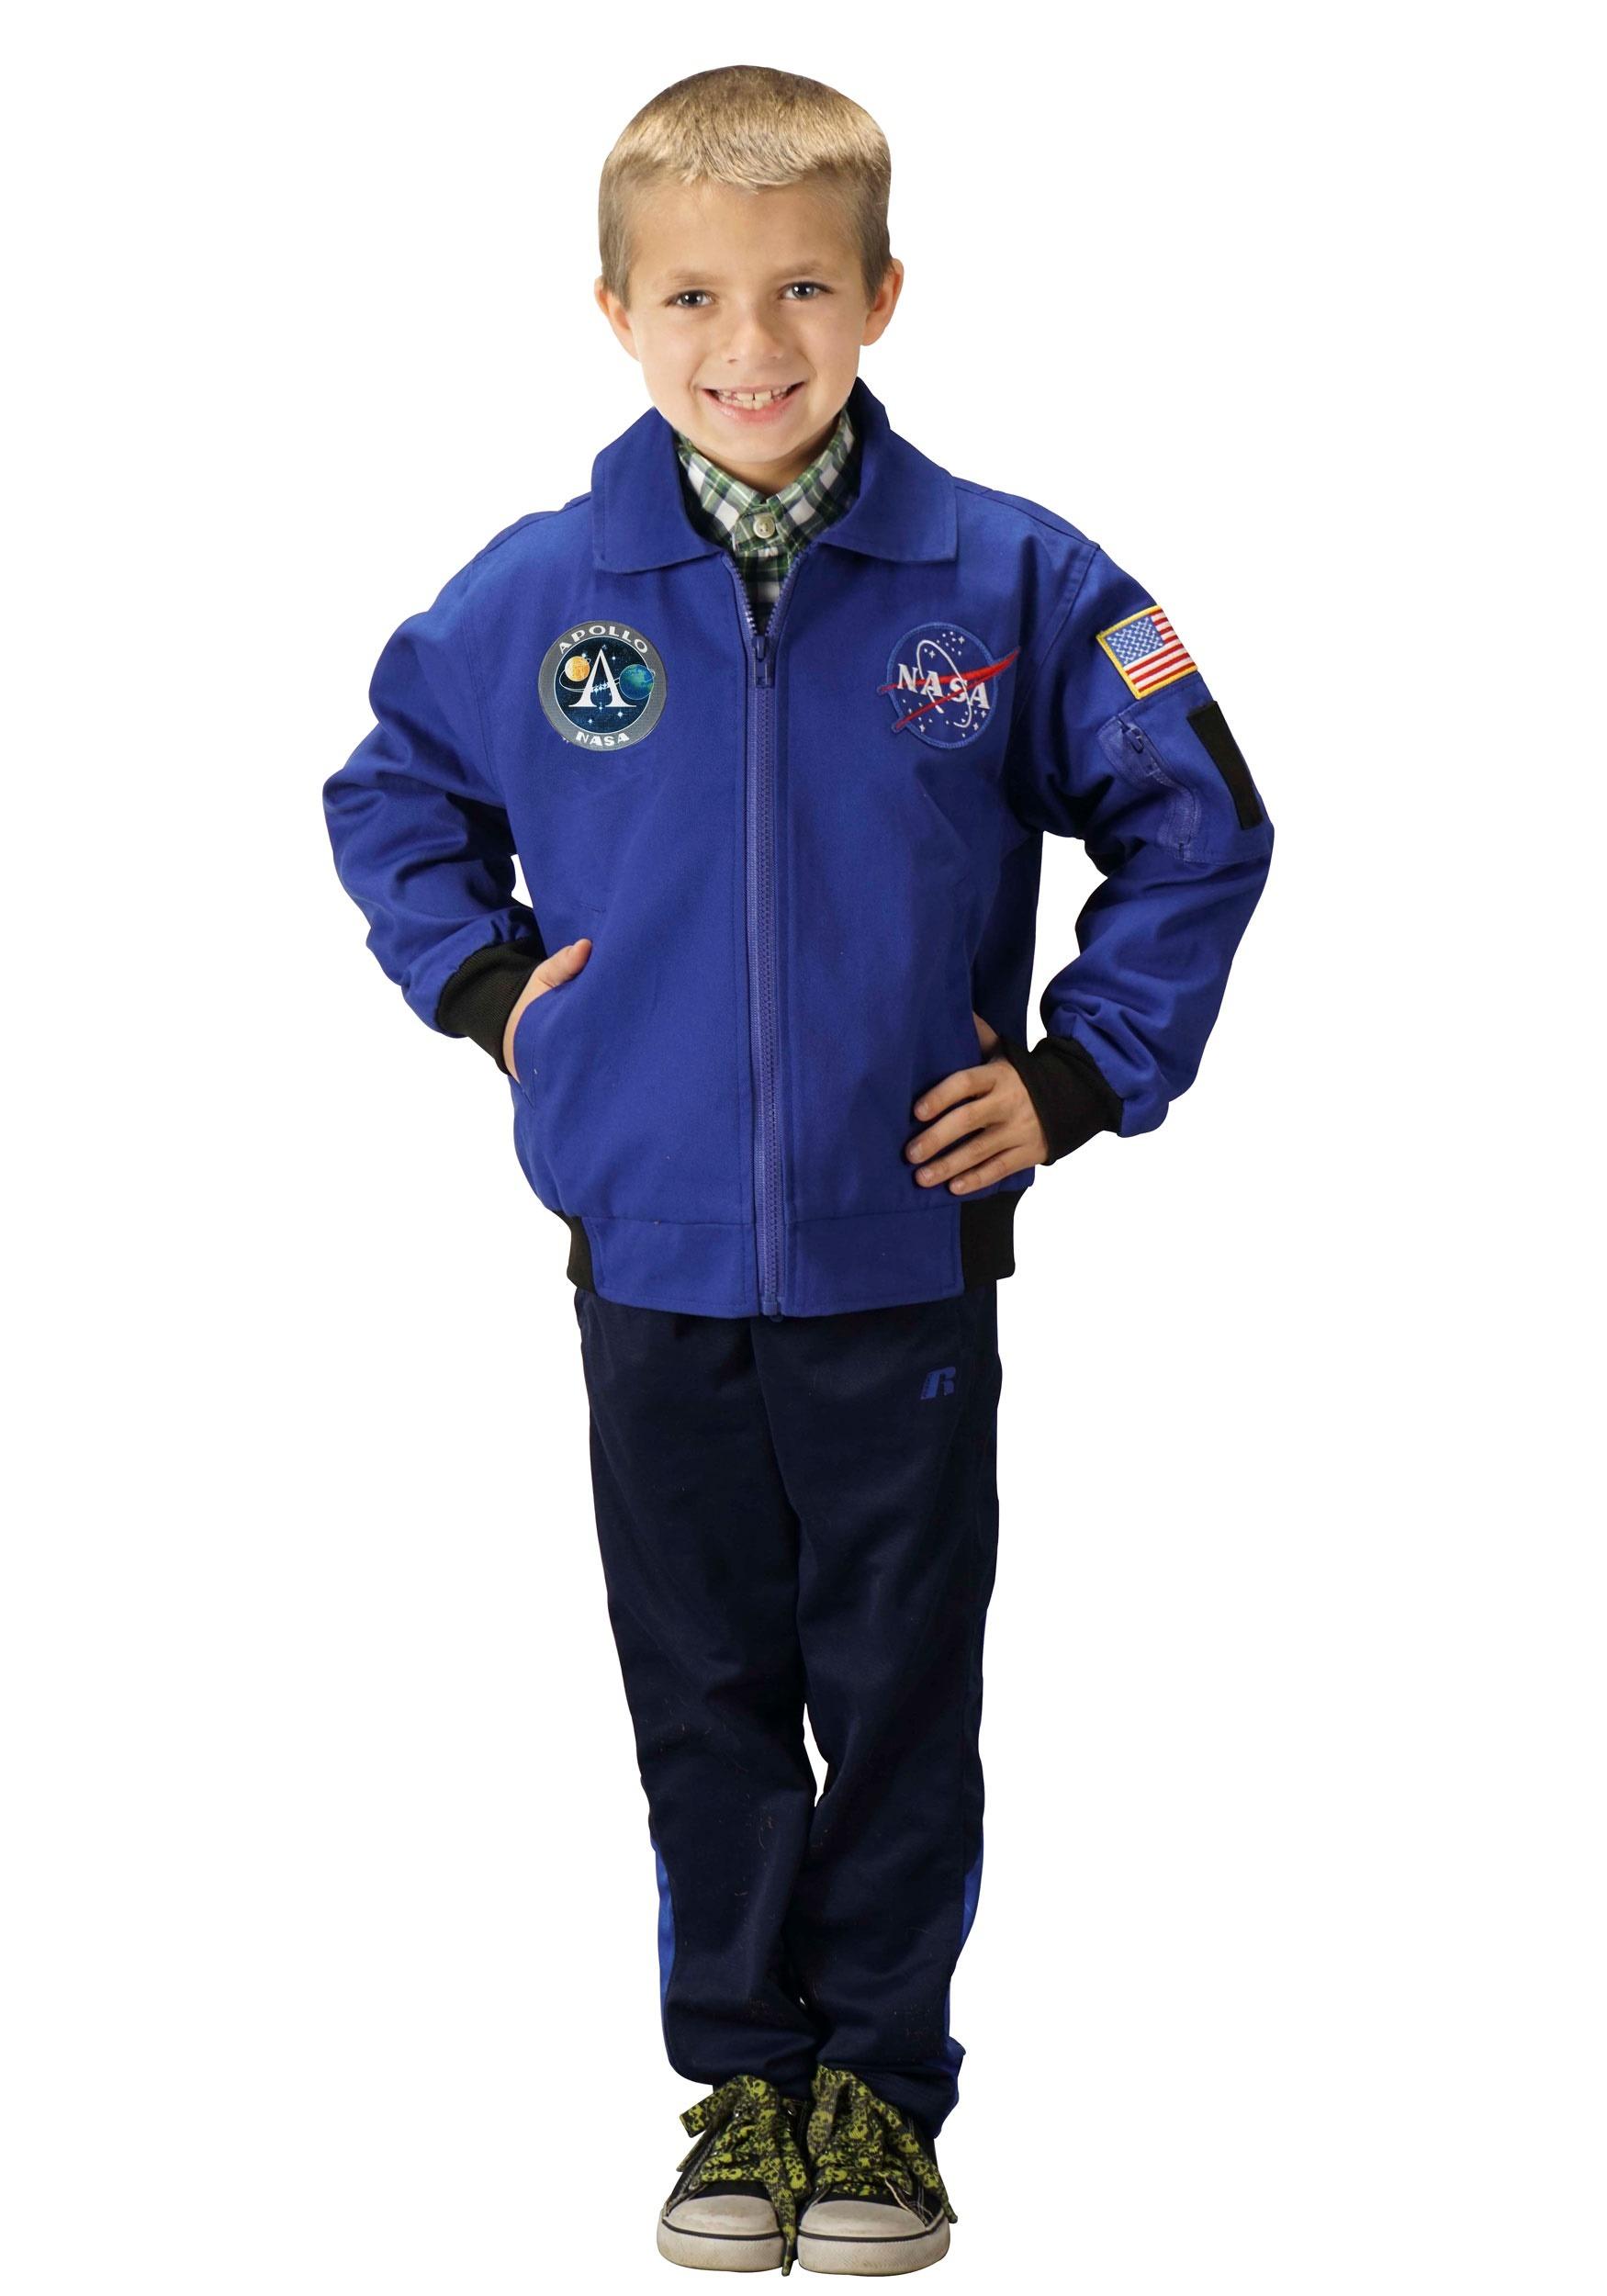 nasa apollo flight jacket - photo #19